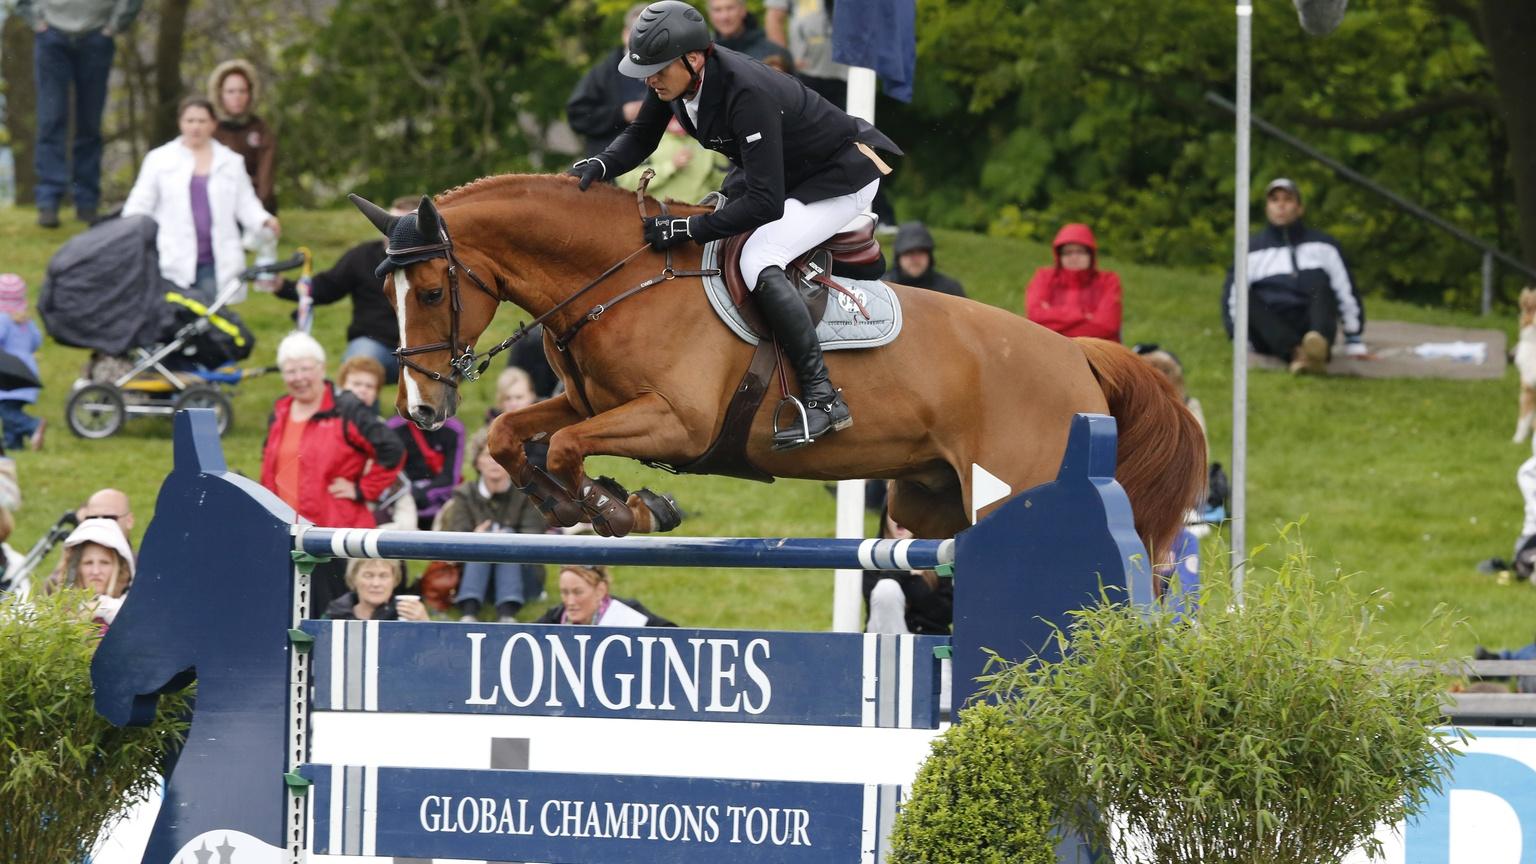 Global Champions Tour: Guadiano quarto, Deuber vince